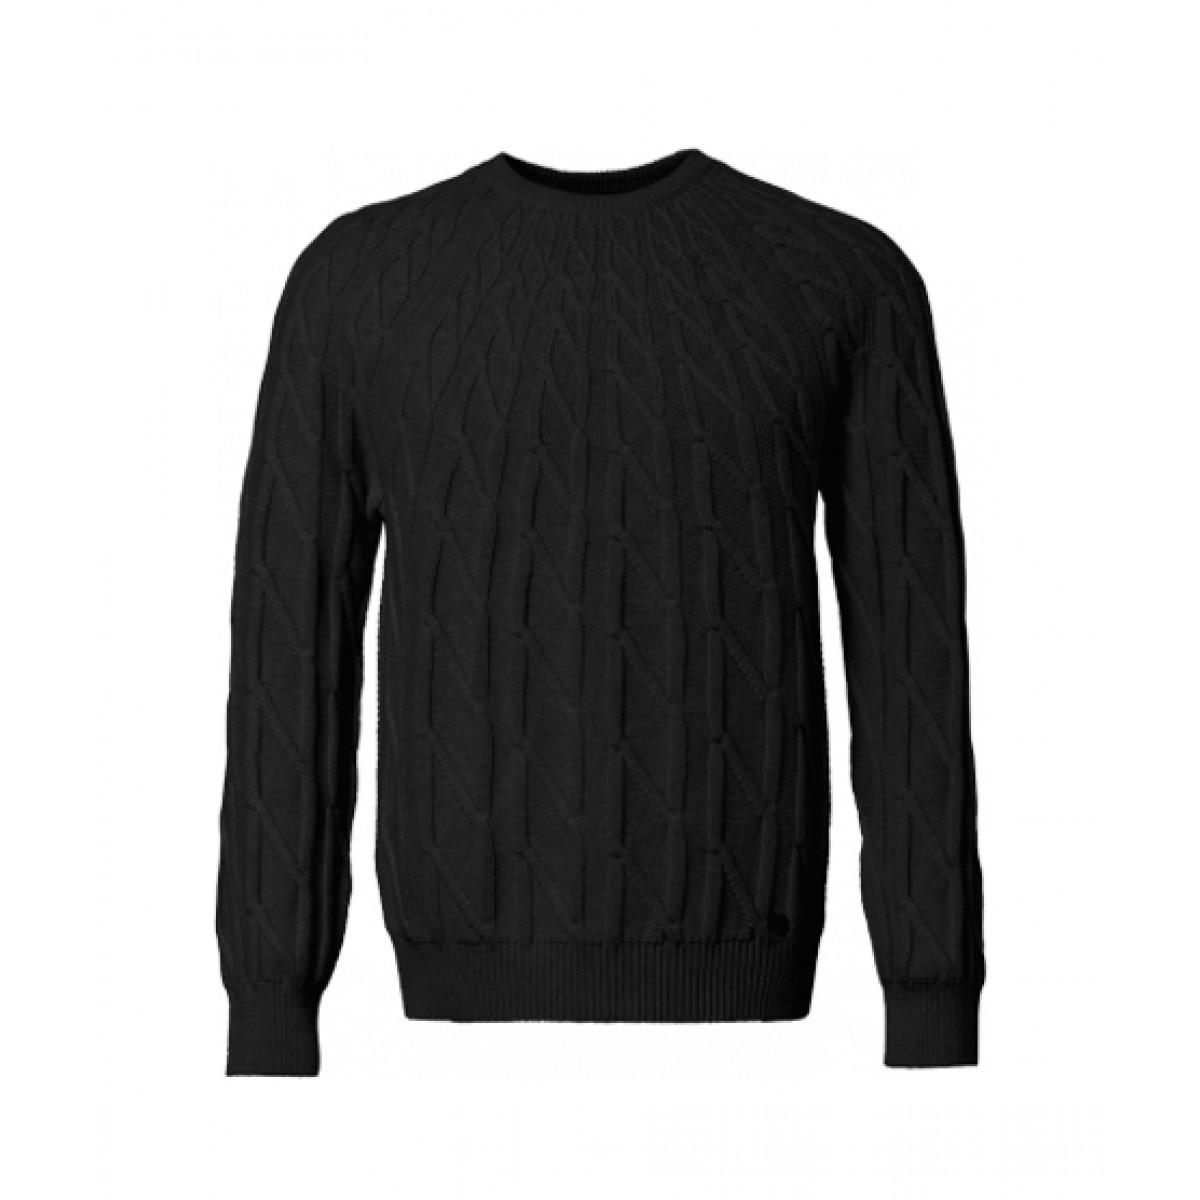 e3d27a0cb8a3 Porsche Design Cable Men s Sweater Price in Pakistan